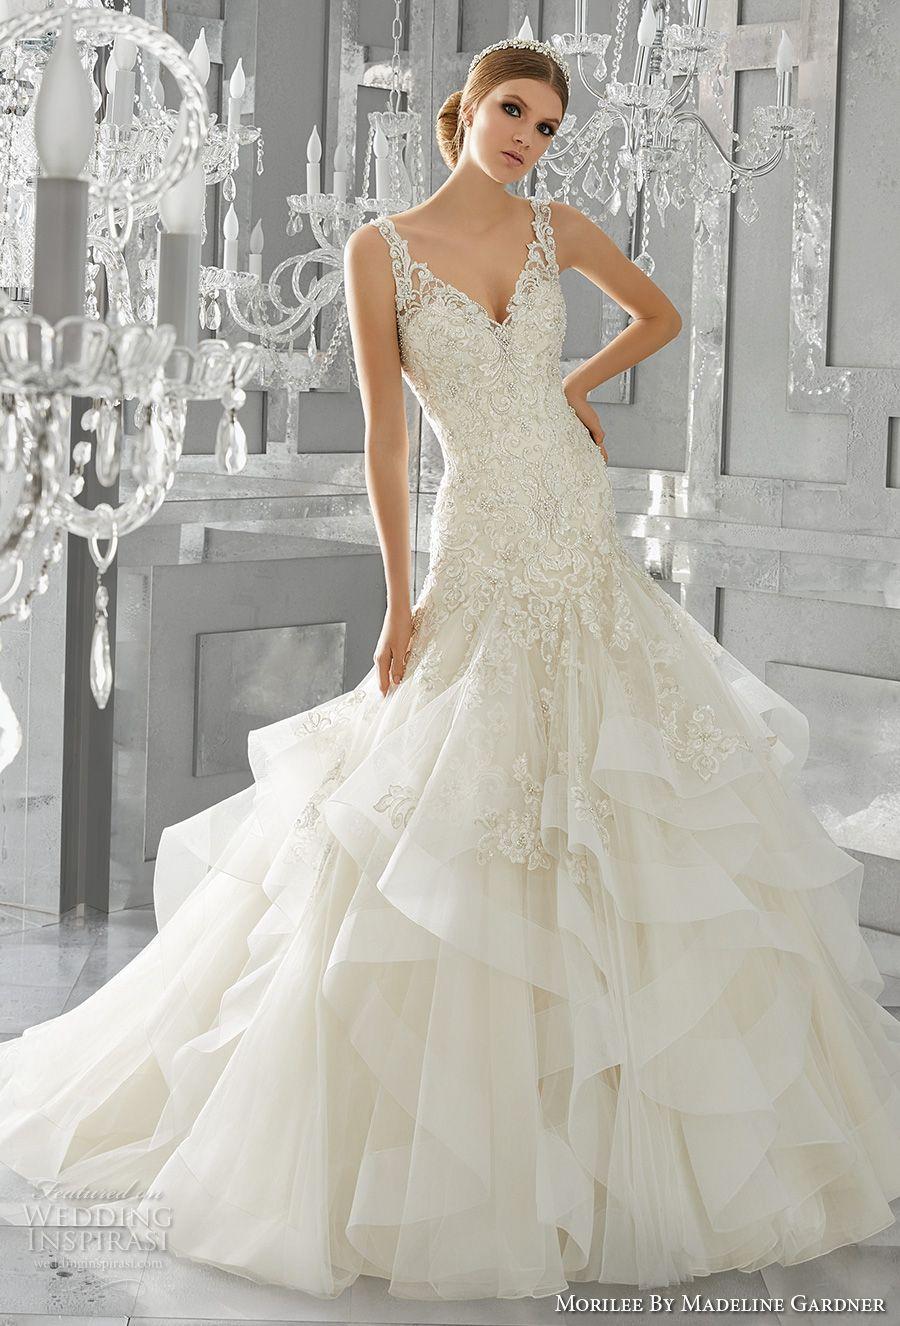 Morilee By Madeline Gardner Fall 2017 Wedding Dresses Wedding Inspirasi Drop Waist Wedding Dress Lace Top Wedding Dress Mori Lee Wedding Dress [ 1326 x 900 Pixel ]